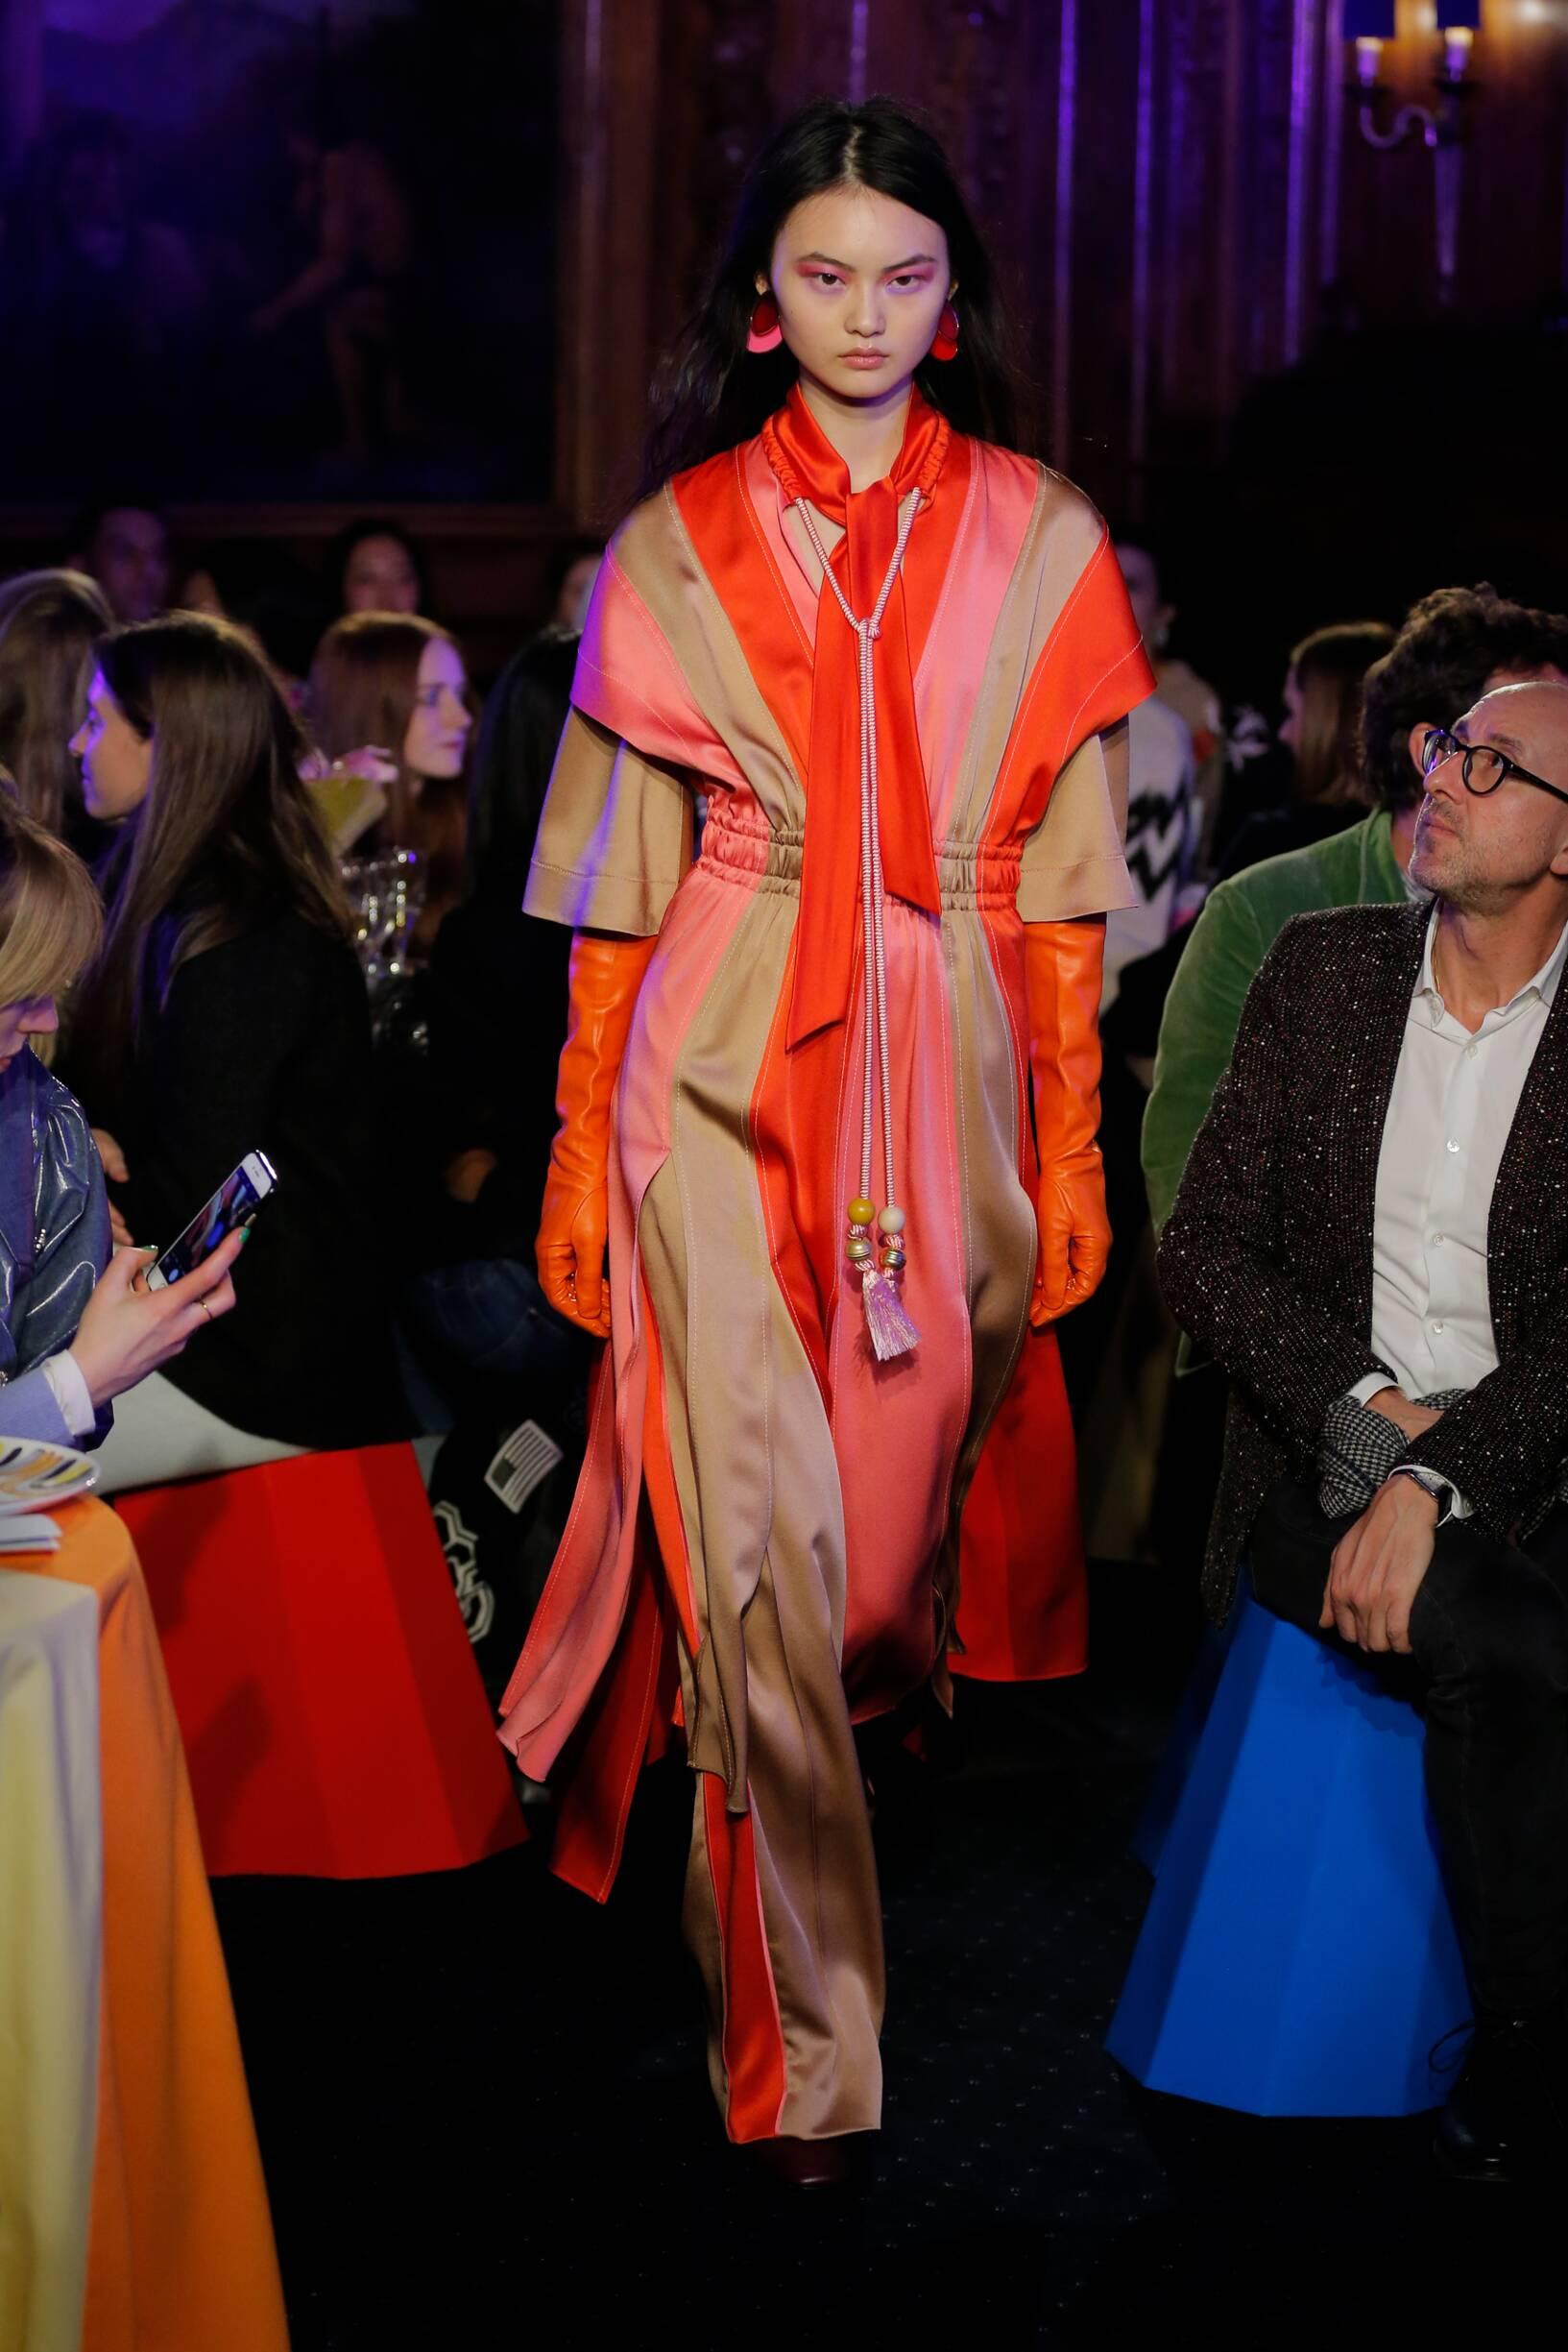 FW 2018-19 Peter Pilotto Fashion Show